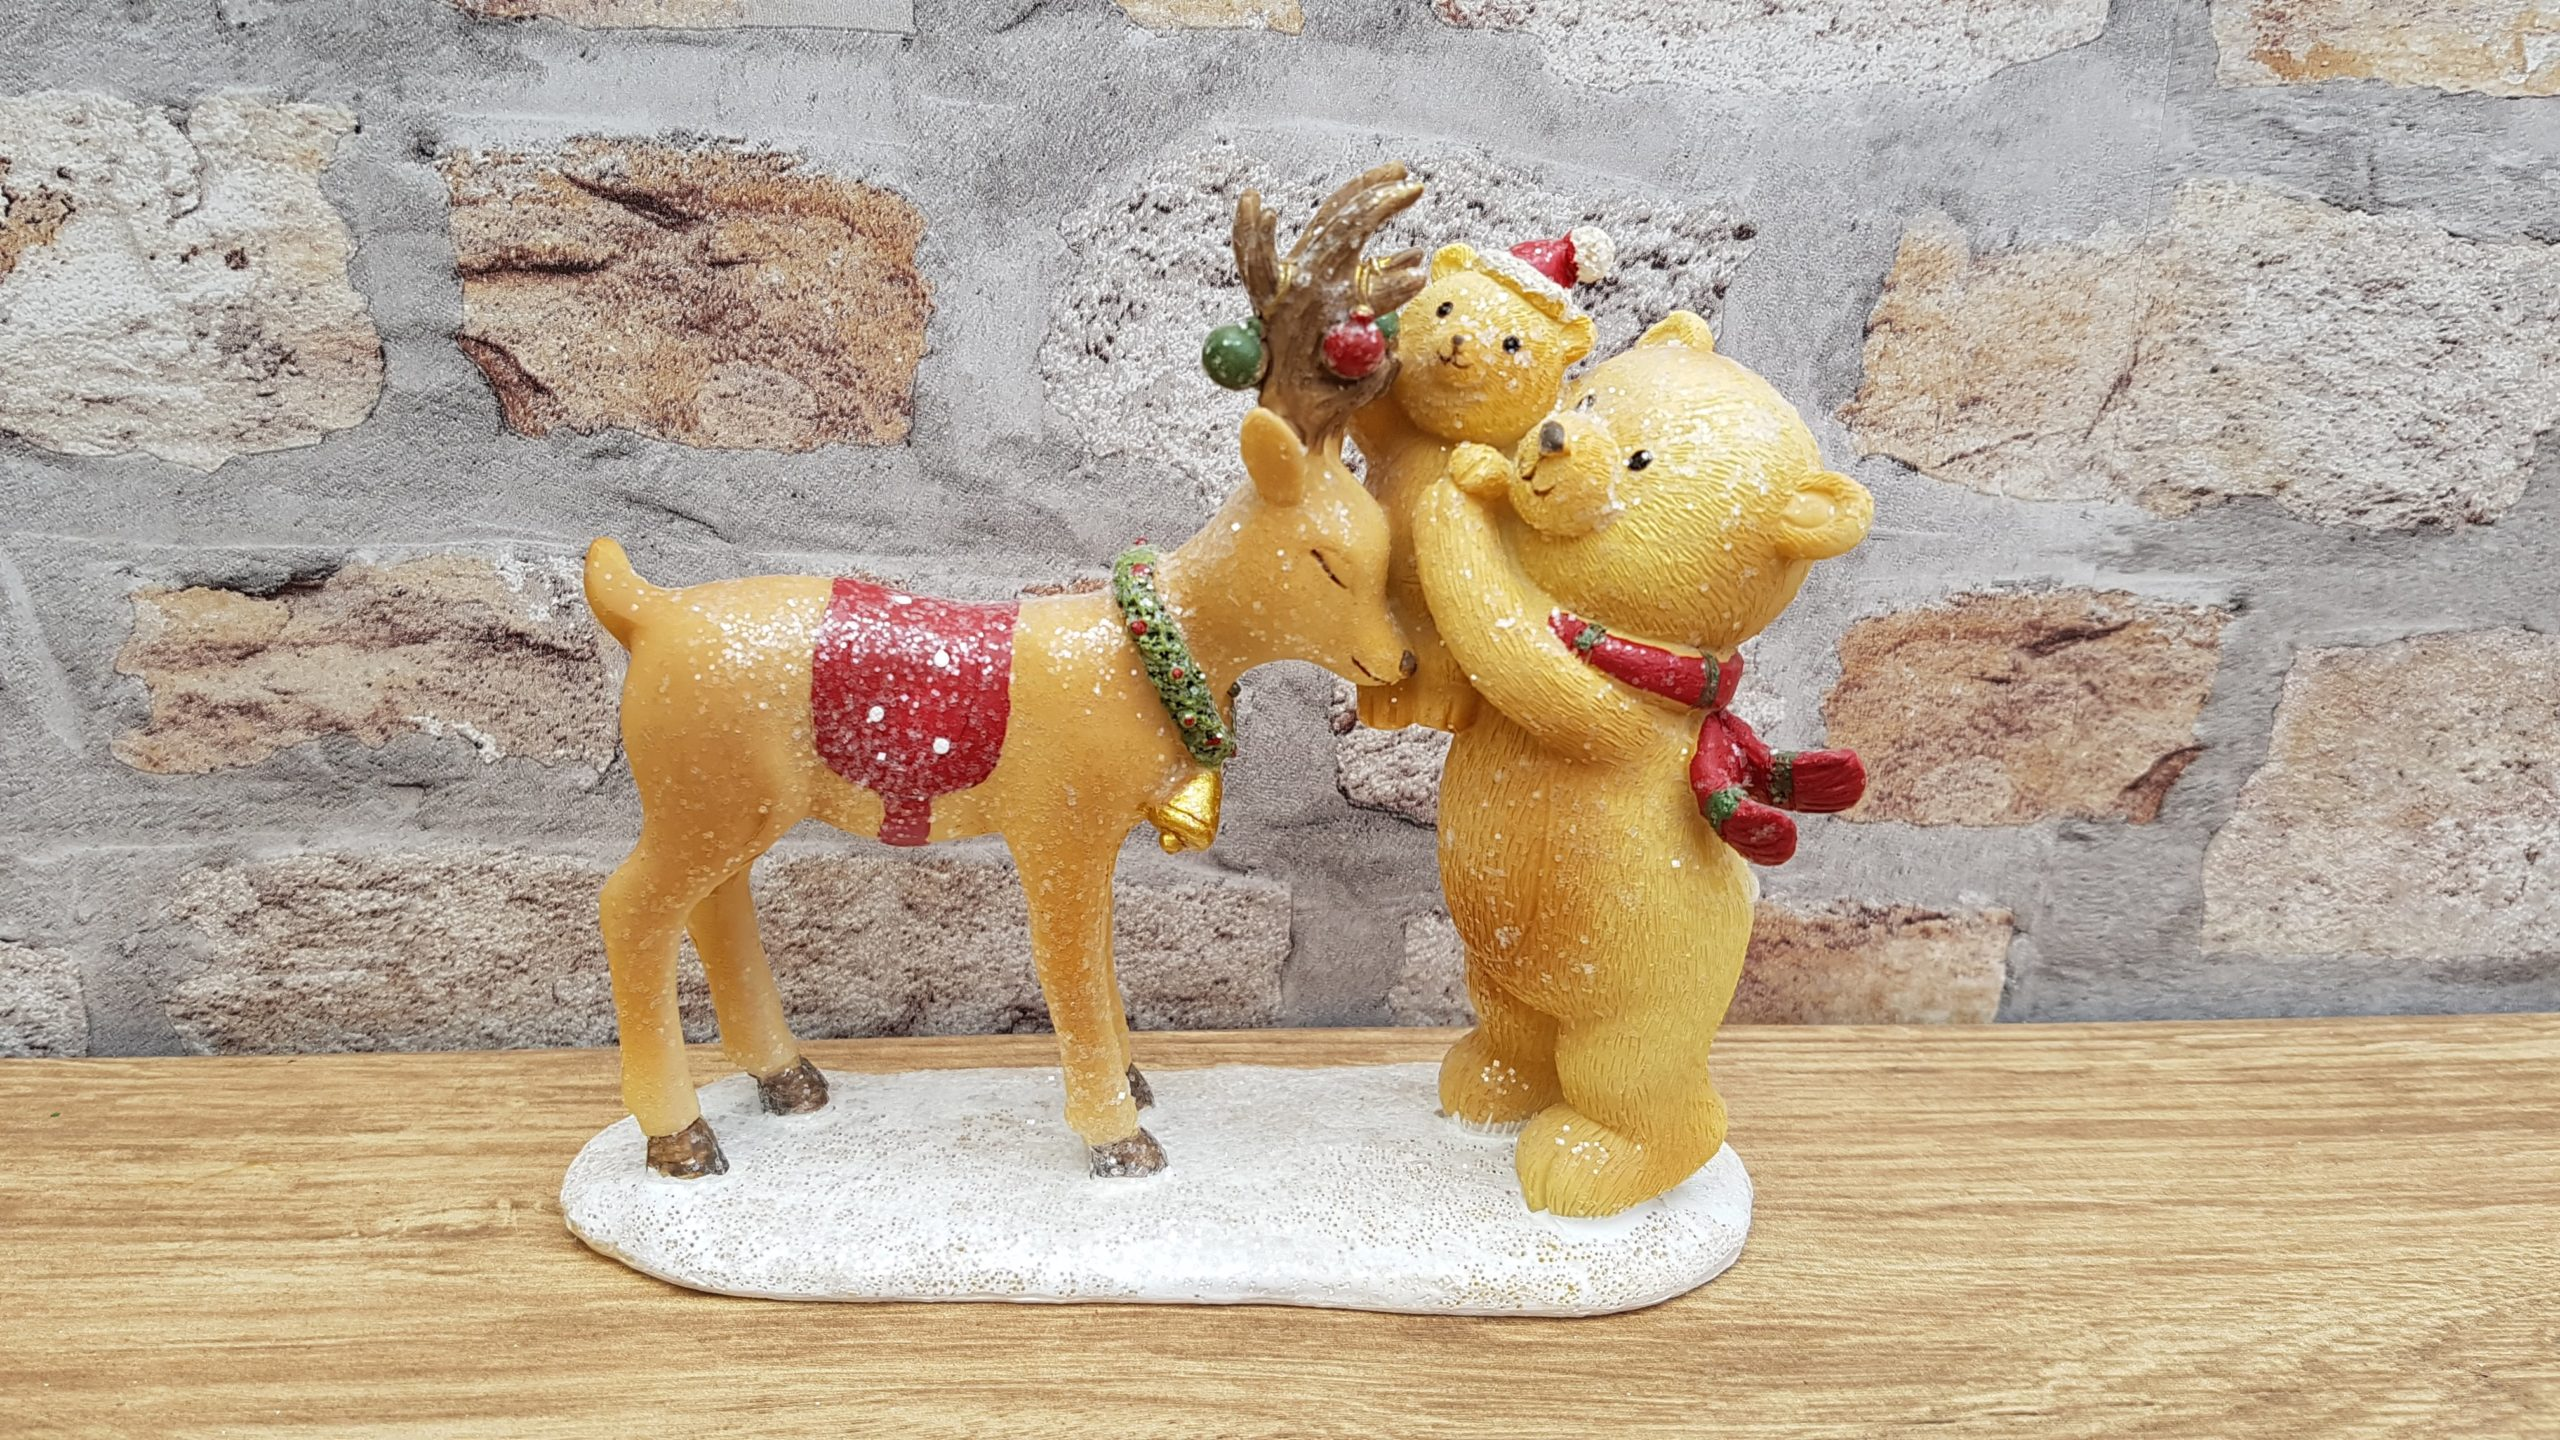 bear and reindeer scene